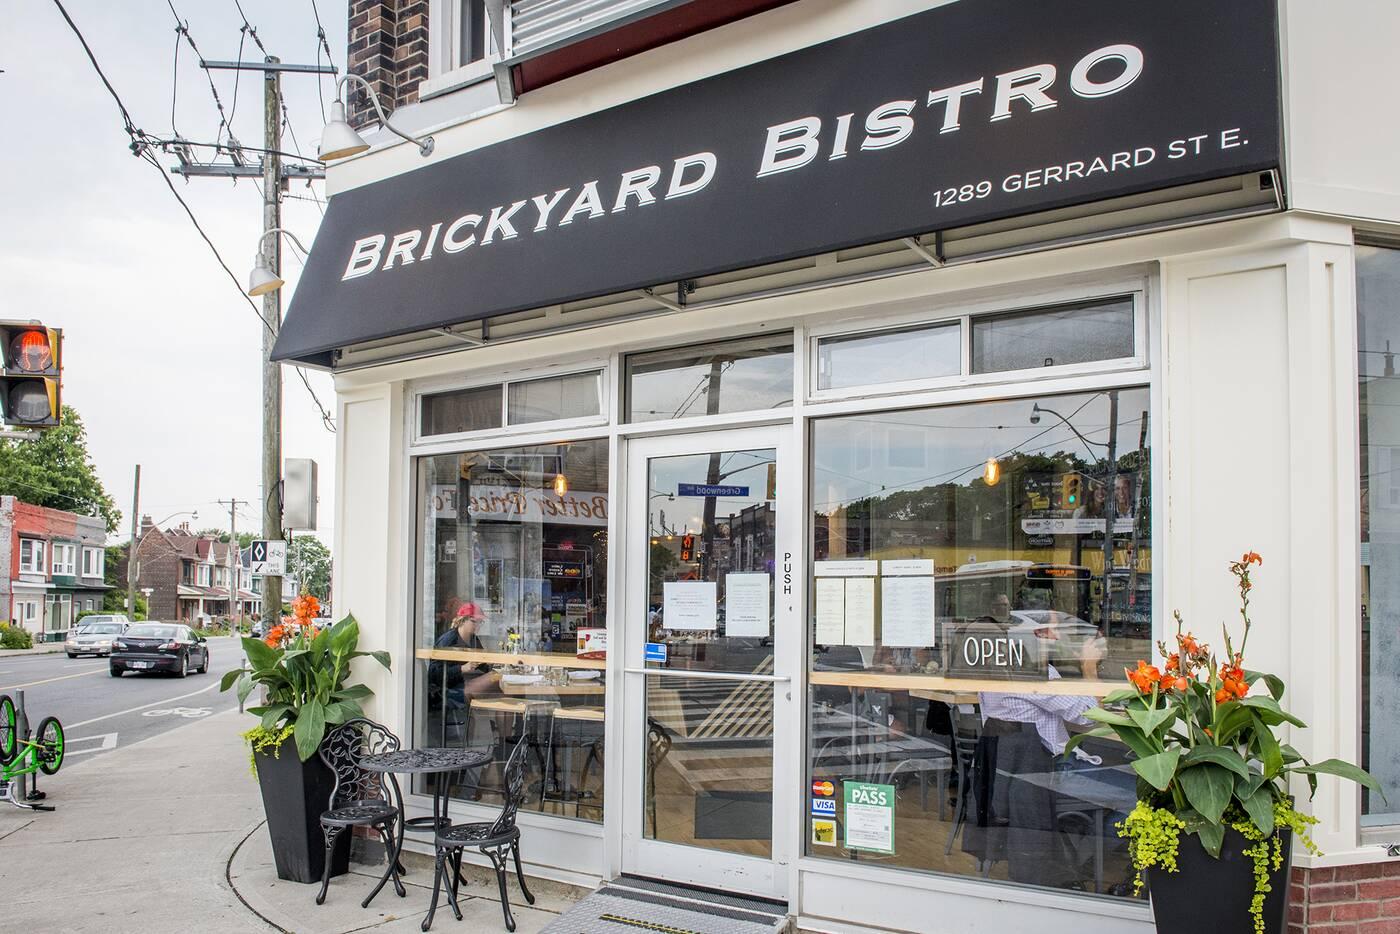 Brickyard Bistro Toronto